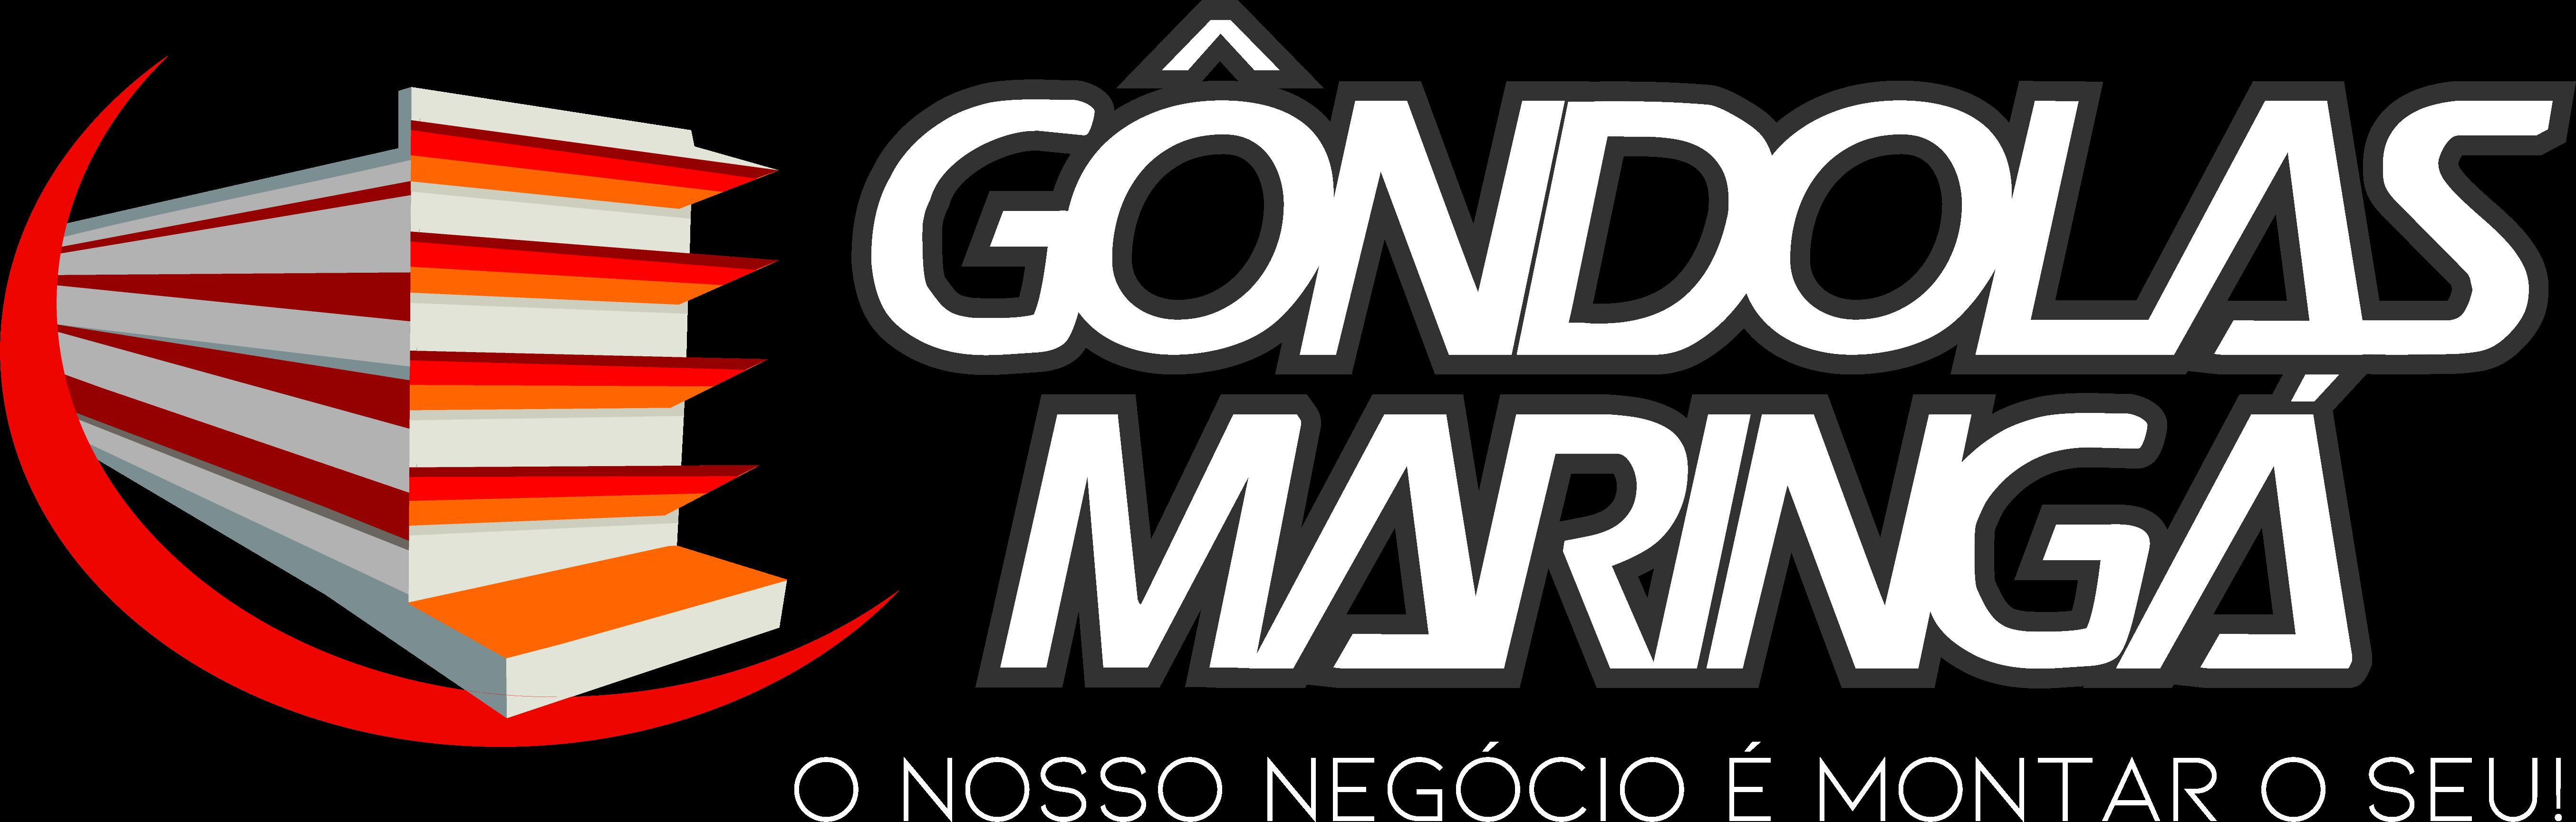 Gôndolas Maringá